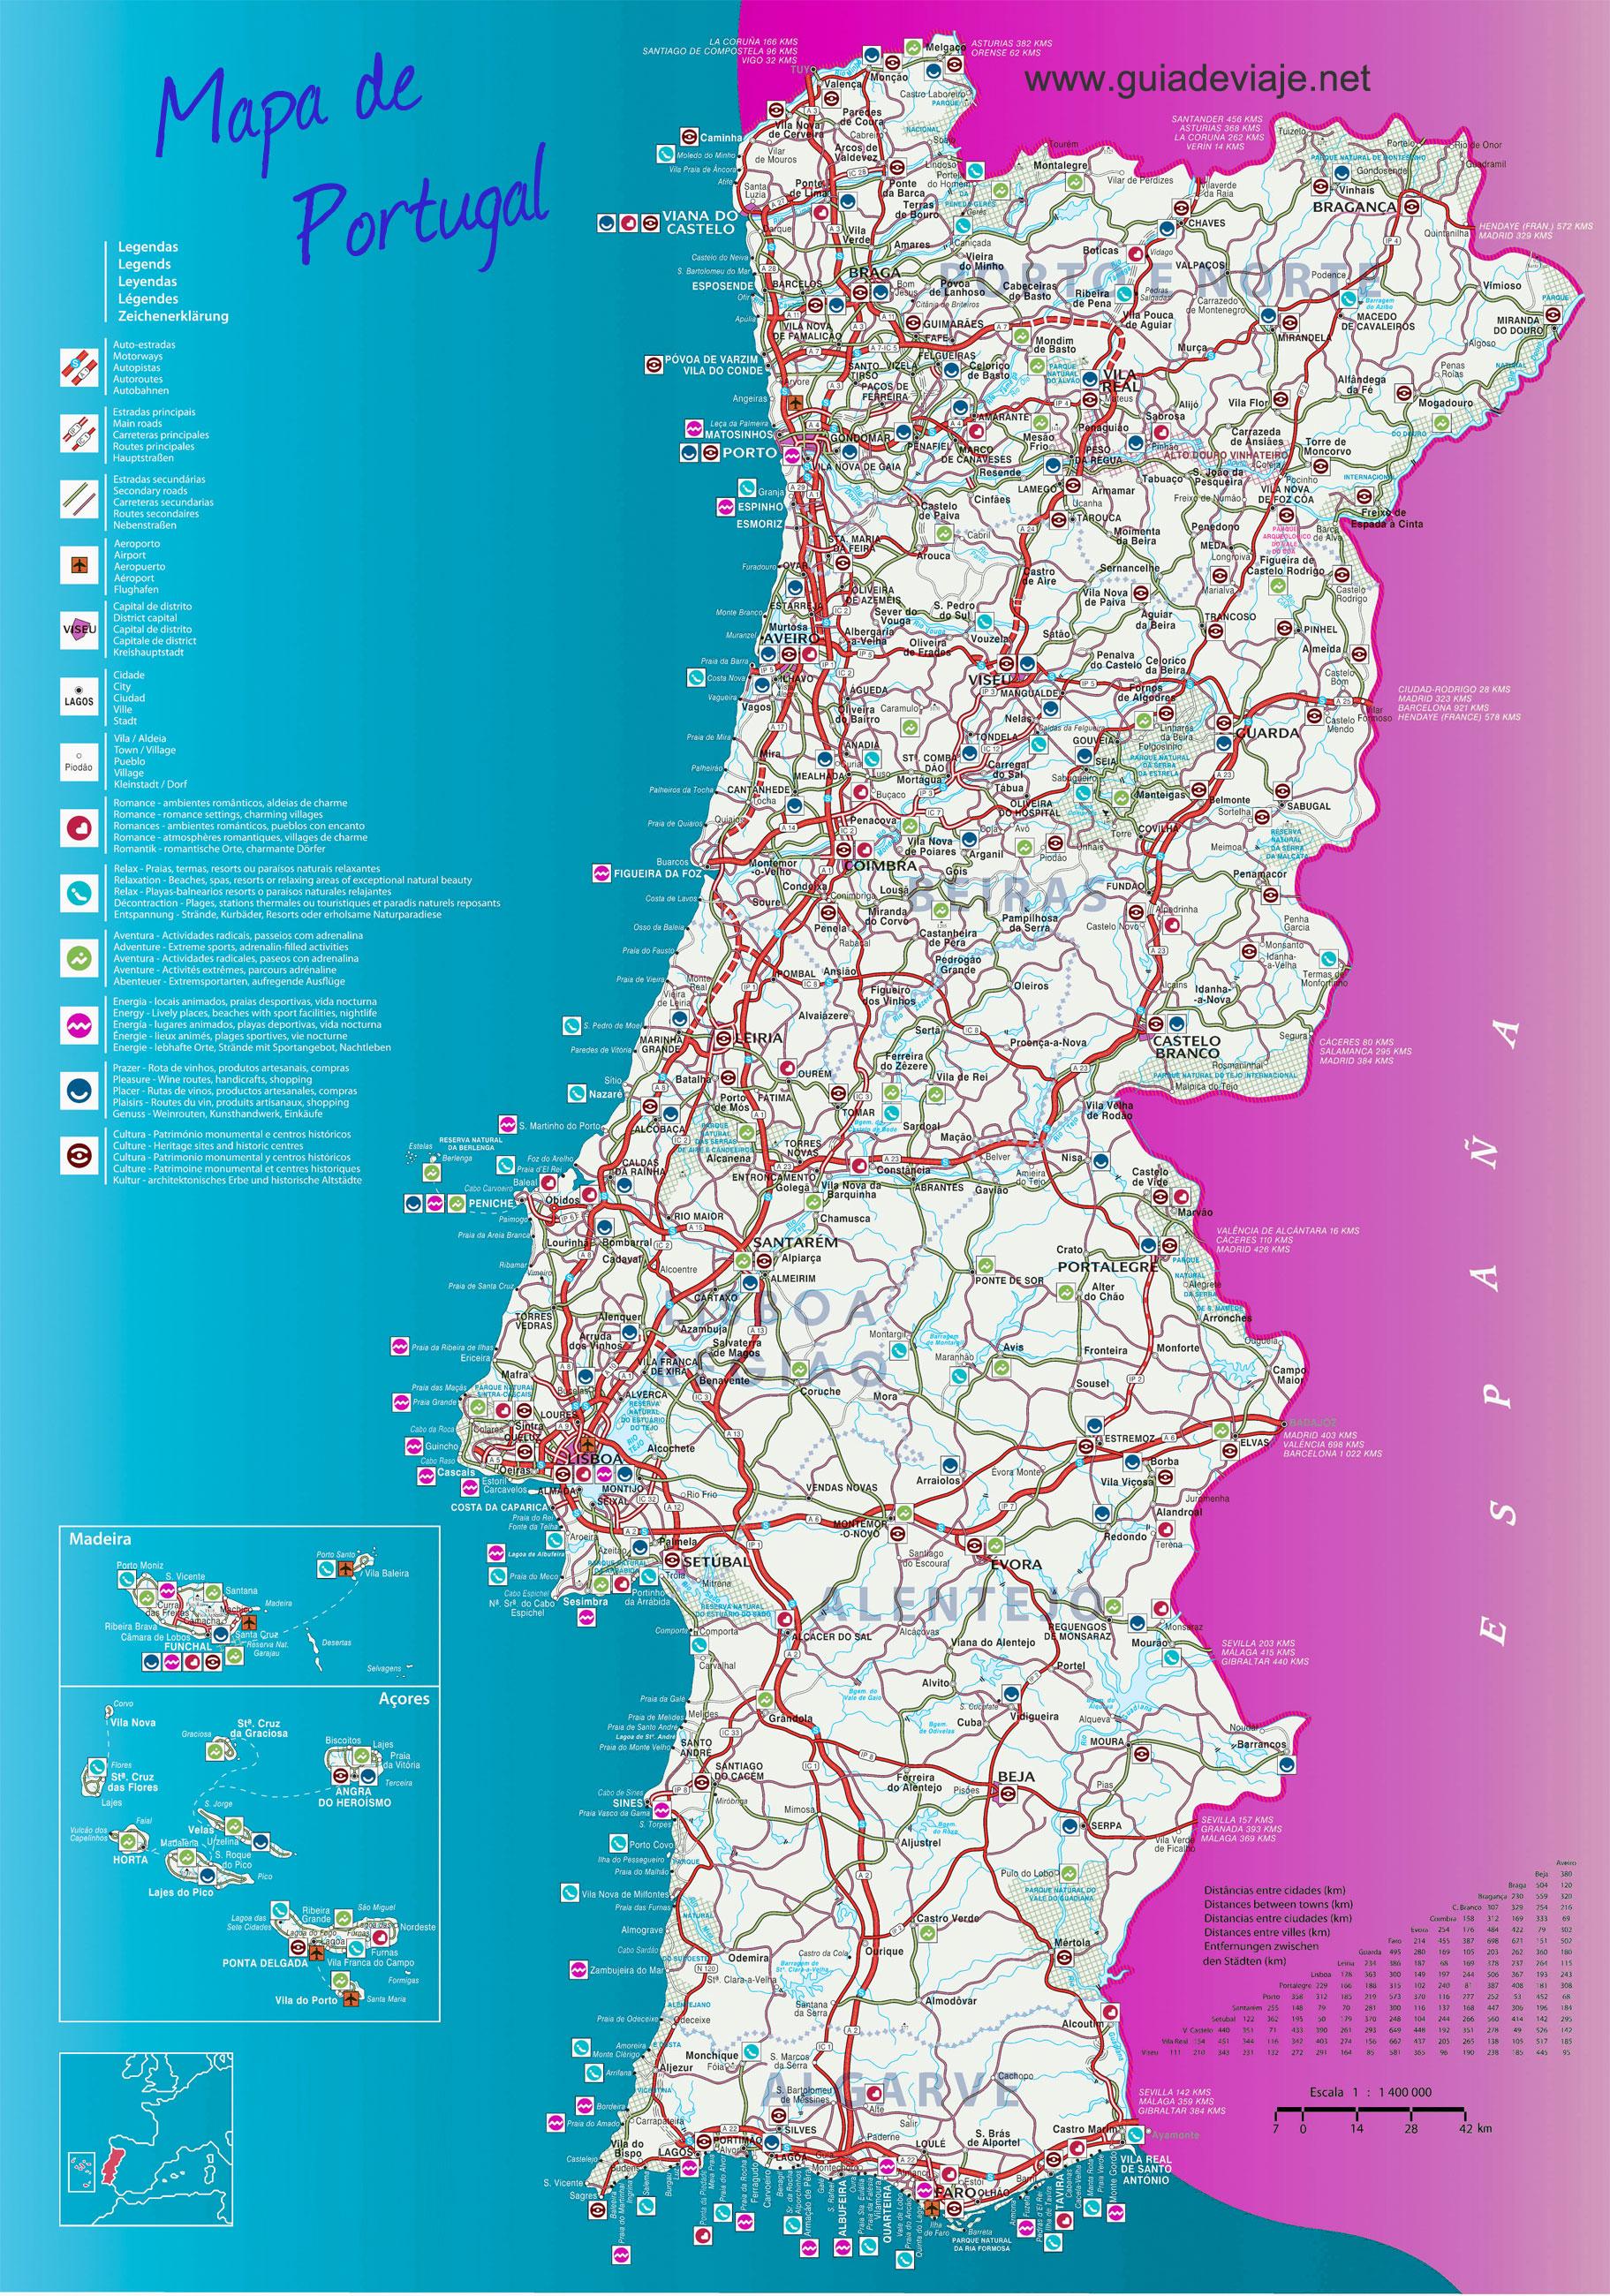 ver mapa de portugal Mapa de Portugal ver mapa de portugal